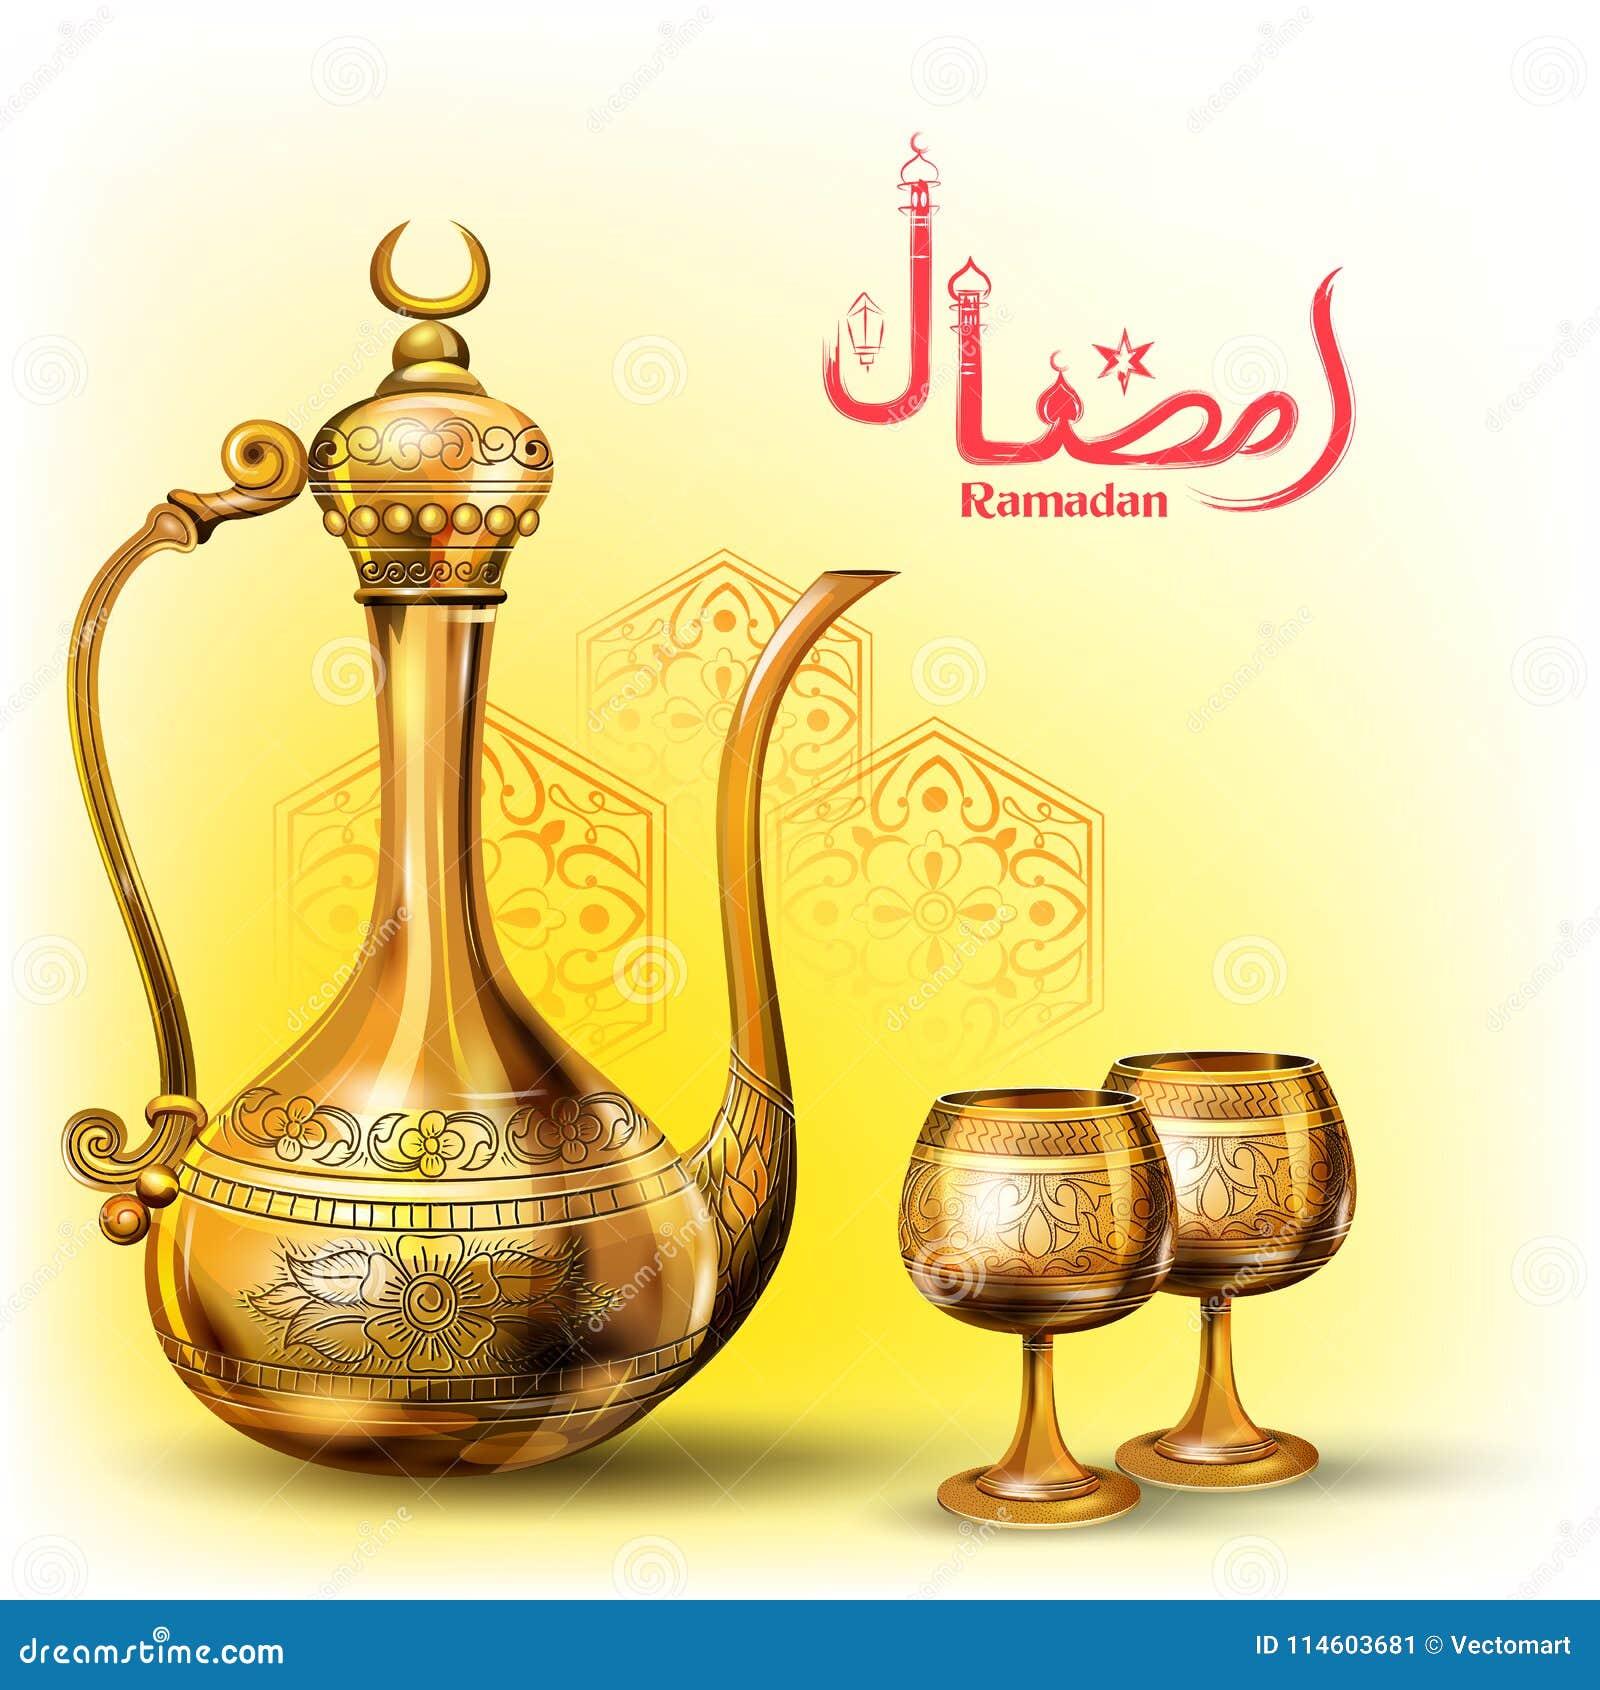 Ramadan kareem generous ramadan greetings for islam religious download ramadan kareem generous ramadan greetings for islam religious festival eid with olden floral frame stock m4hsunfo